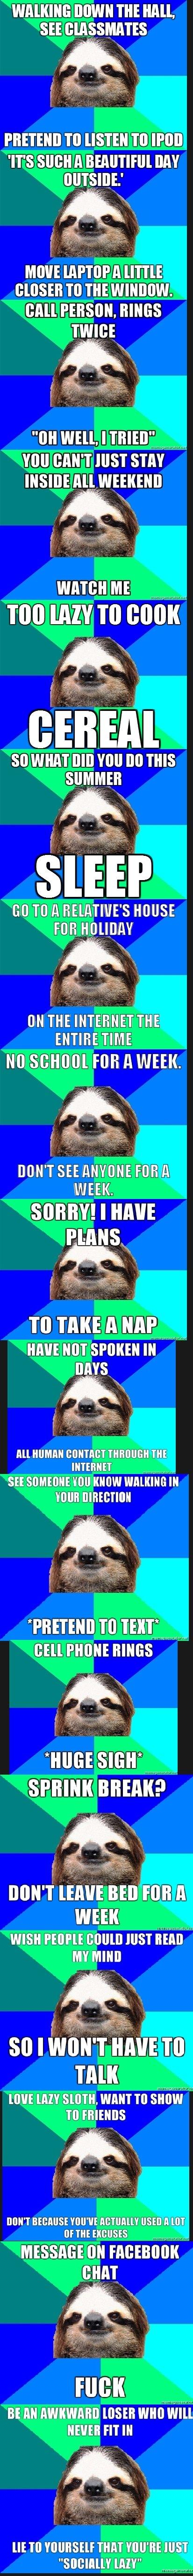 Socially Lazy Sloth. Credit to sociallylazysloth.tumblr.com.. WALKING WWII Tilt HAIL unsung.' mason, muss min: WEEKEND DON' T Mullah' Wonkey I mm: TAKE T WWI mm sloth lazy awkward social True